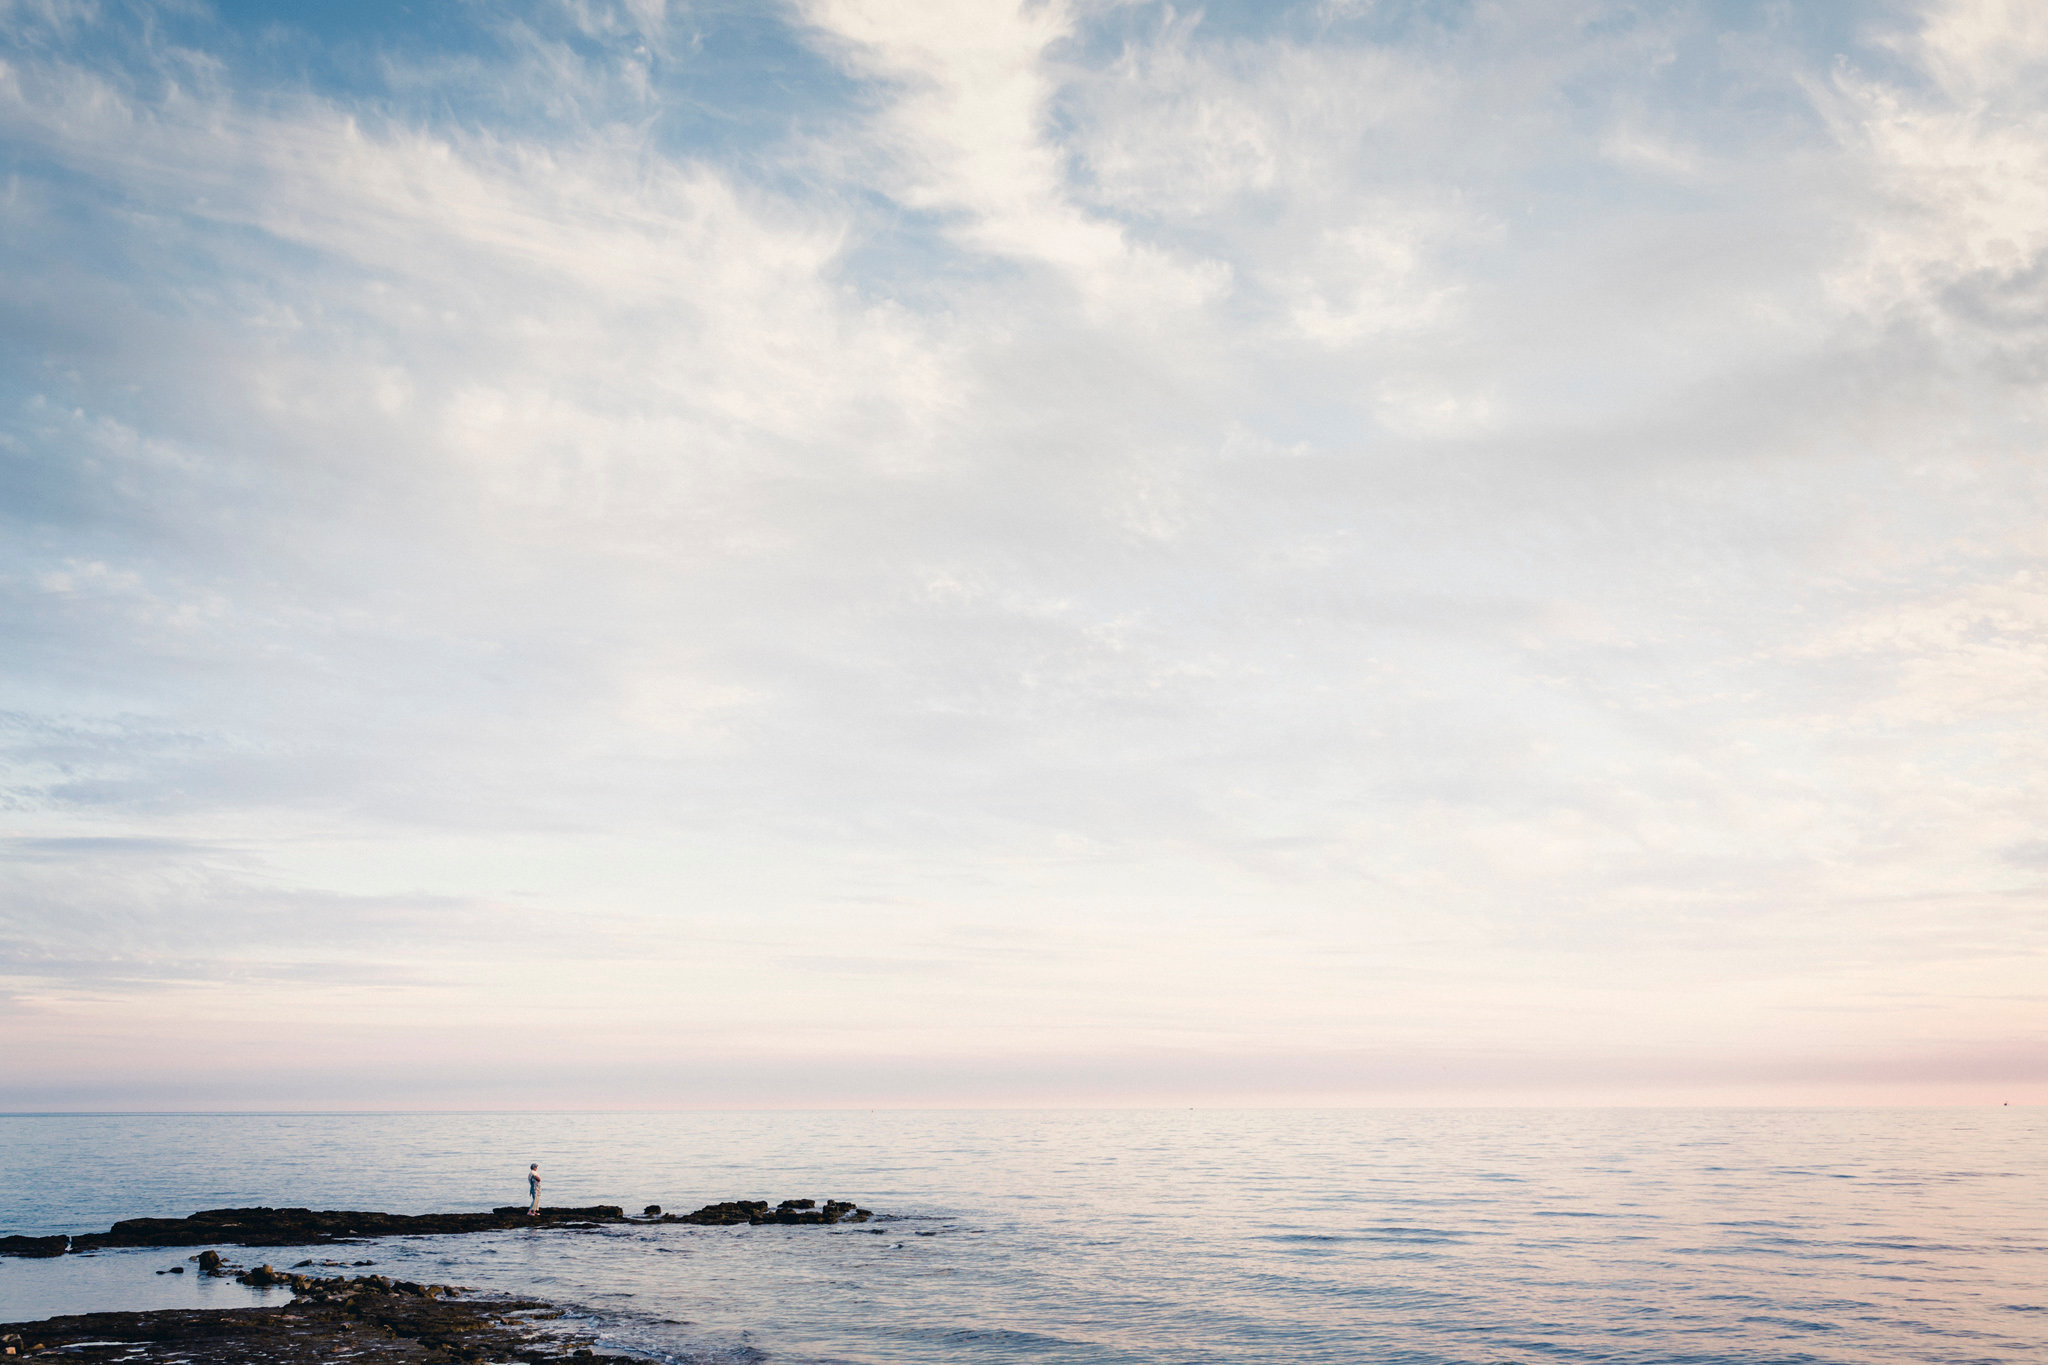 THE SEA 4